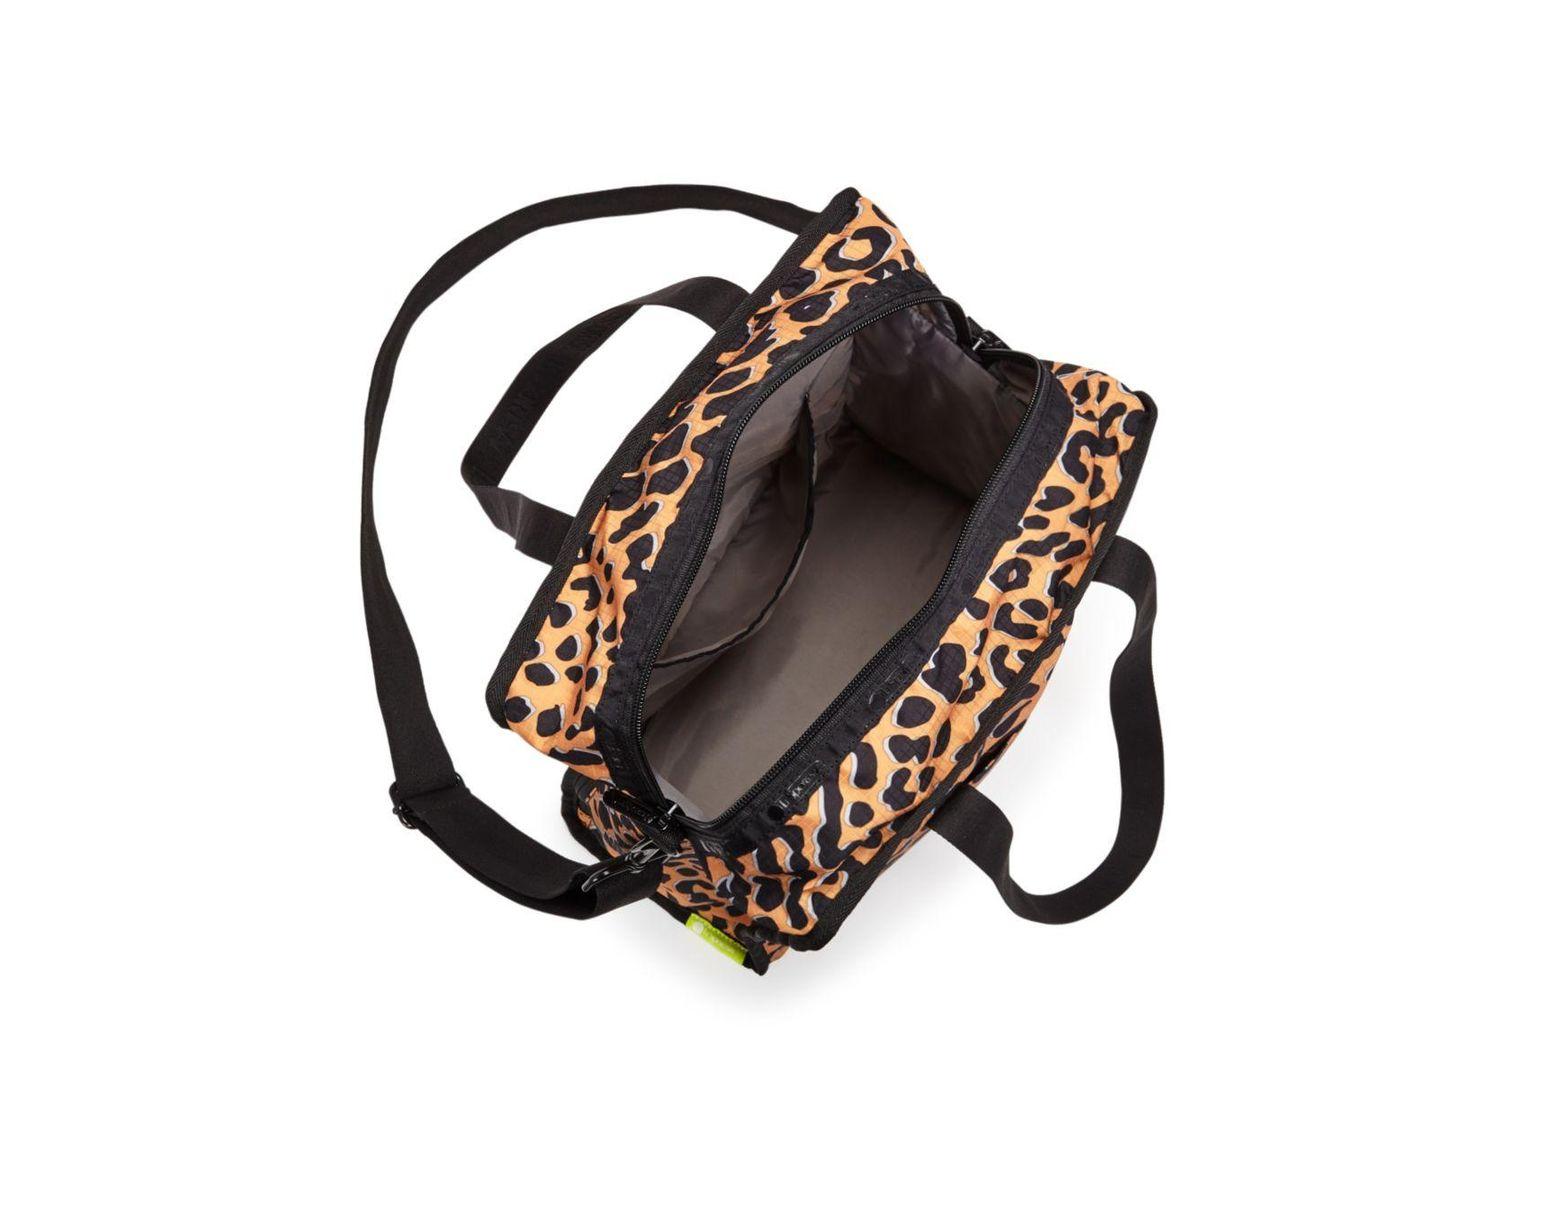 ddf595ba6 LeSportsac Gabrielle Medium Leopard - Print Nylon Box Tote in Black - Lyst